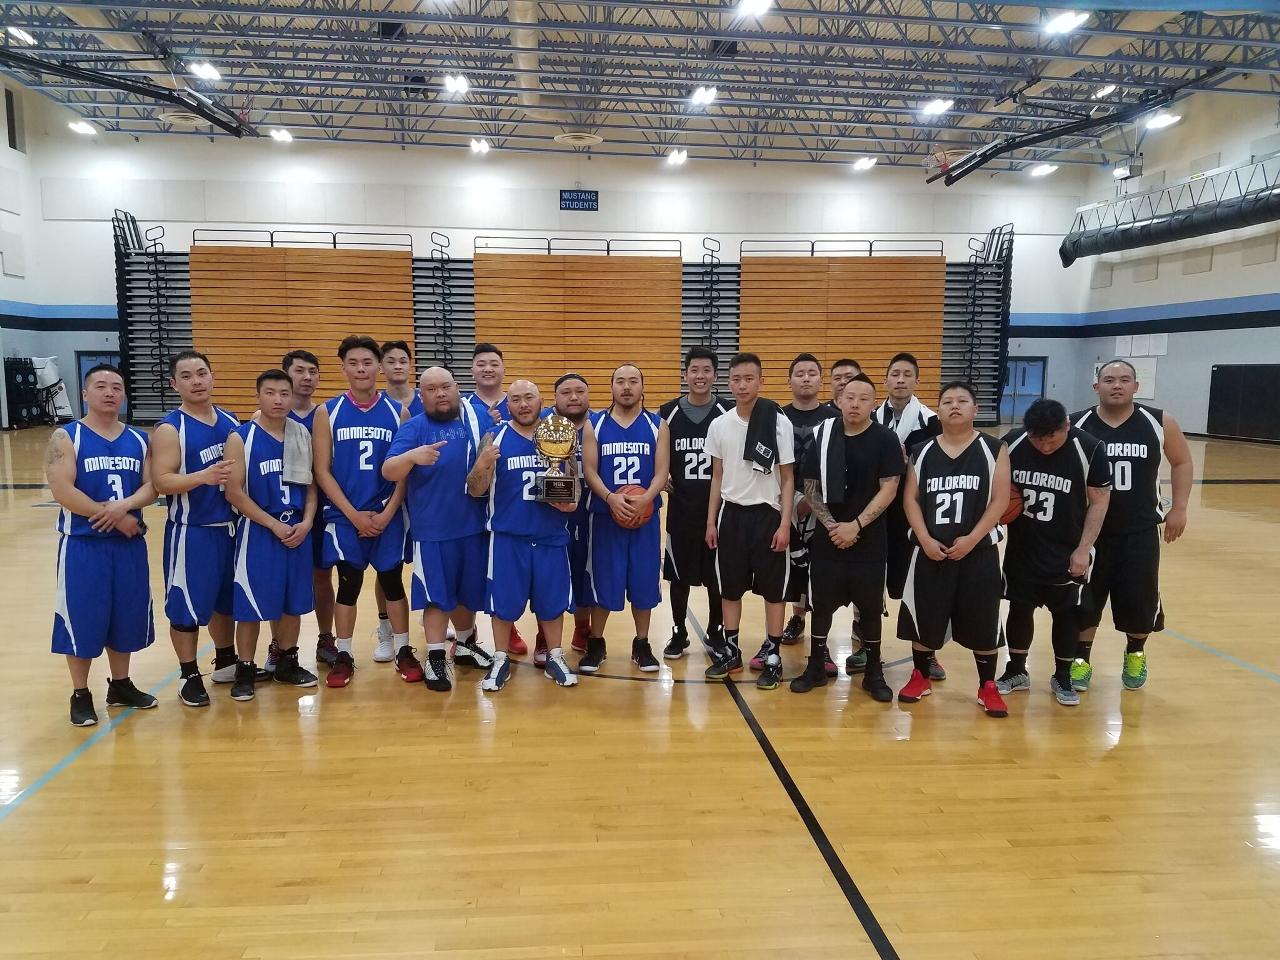 Hmong Basketball League - Hmong Sports Authority